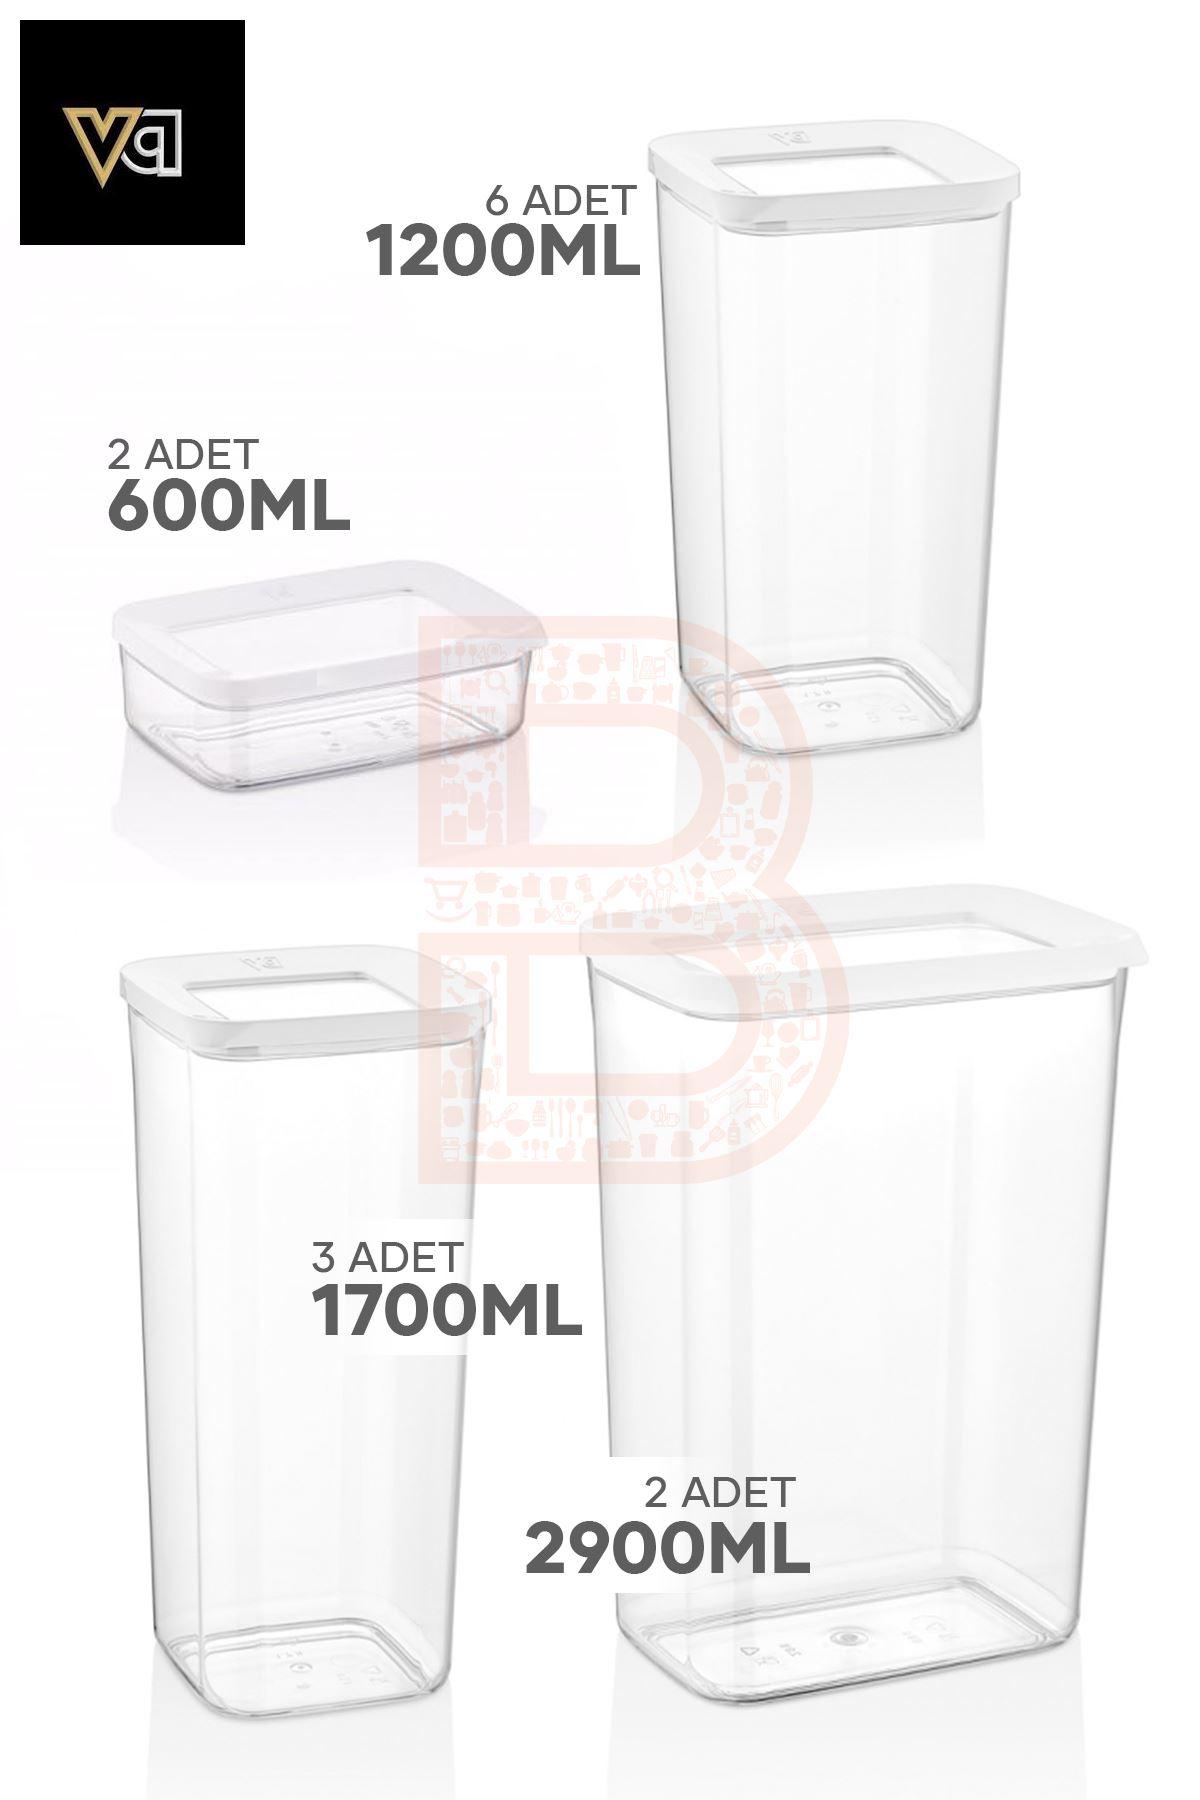 Vip Ahmet 13 Lü Saklama Seti + Kitchen Trend Tekerlekli Siyah Plastik Raf